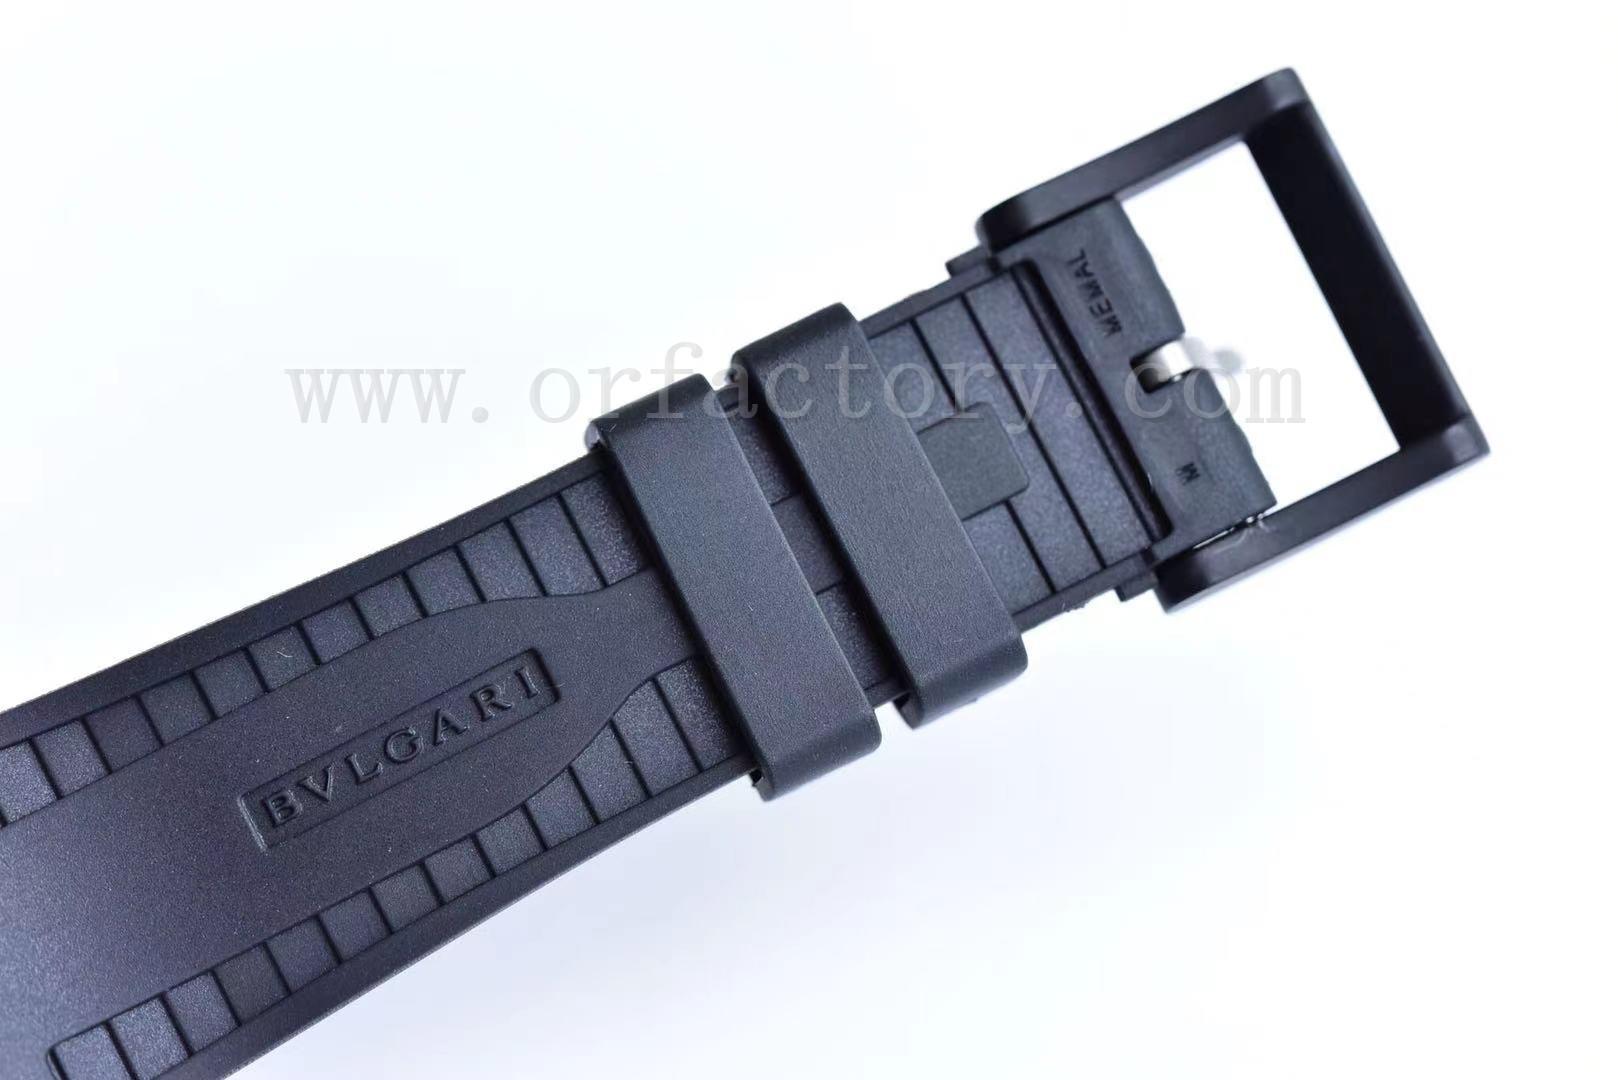 GF厂宝格丽Diagono系列41mm腕表V2升级版详细评测